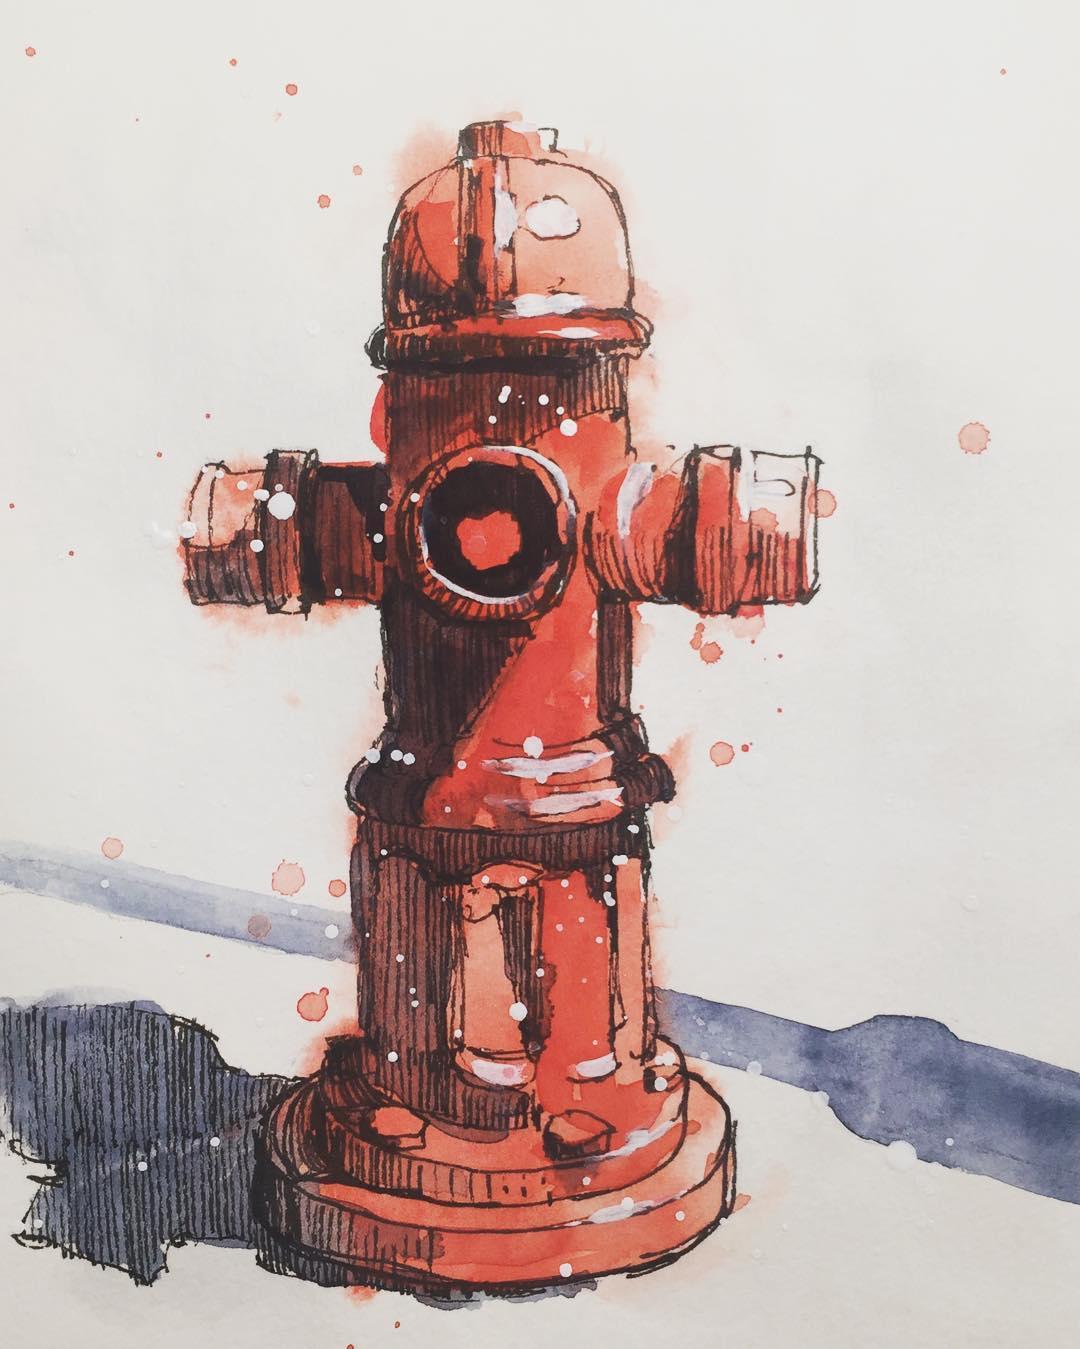 1080x1349 Fire Hydrant Urban Sketch By Jiri Zraly My Original Paintings